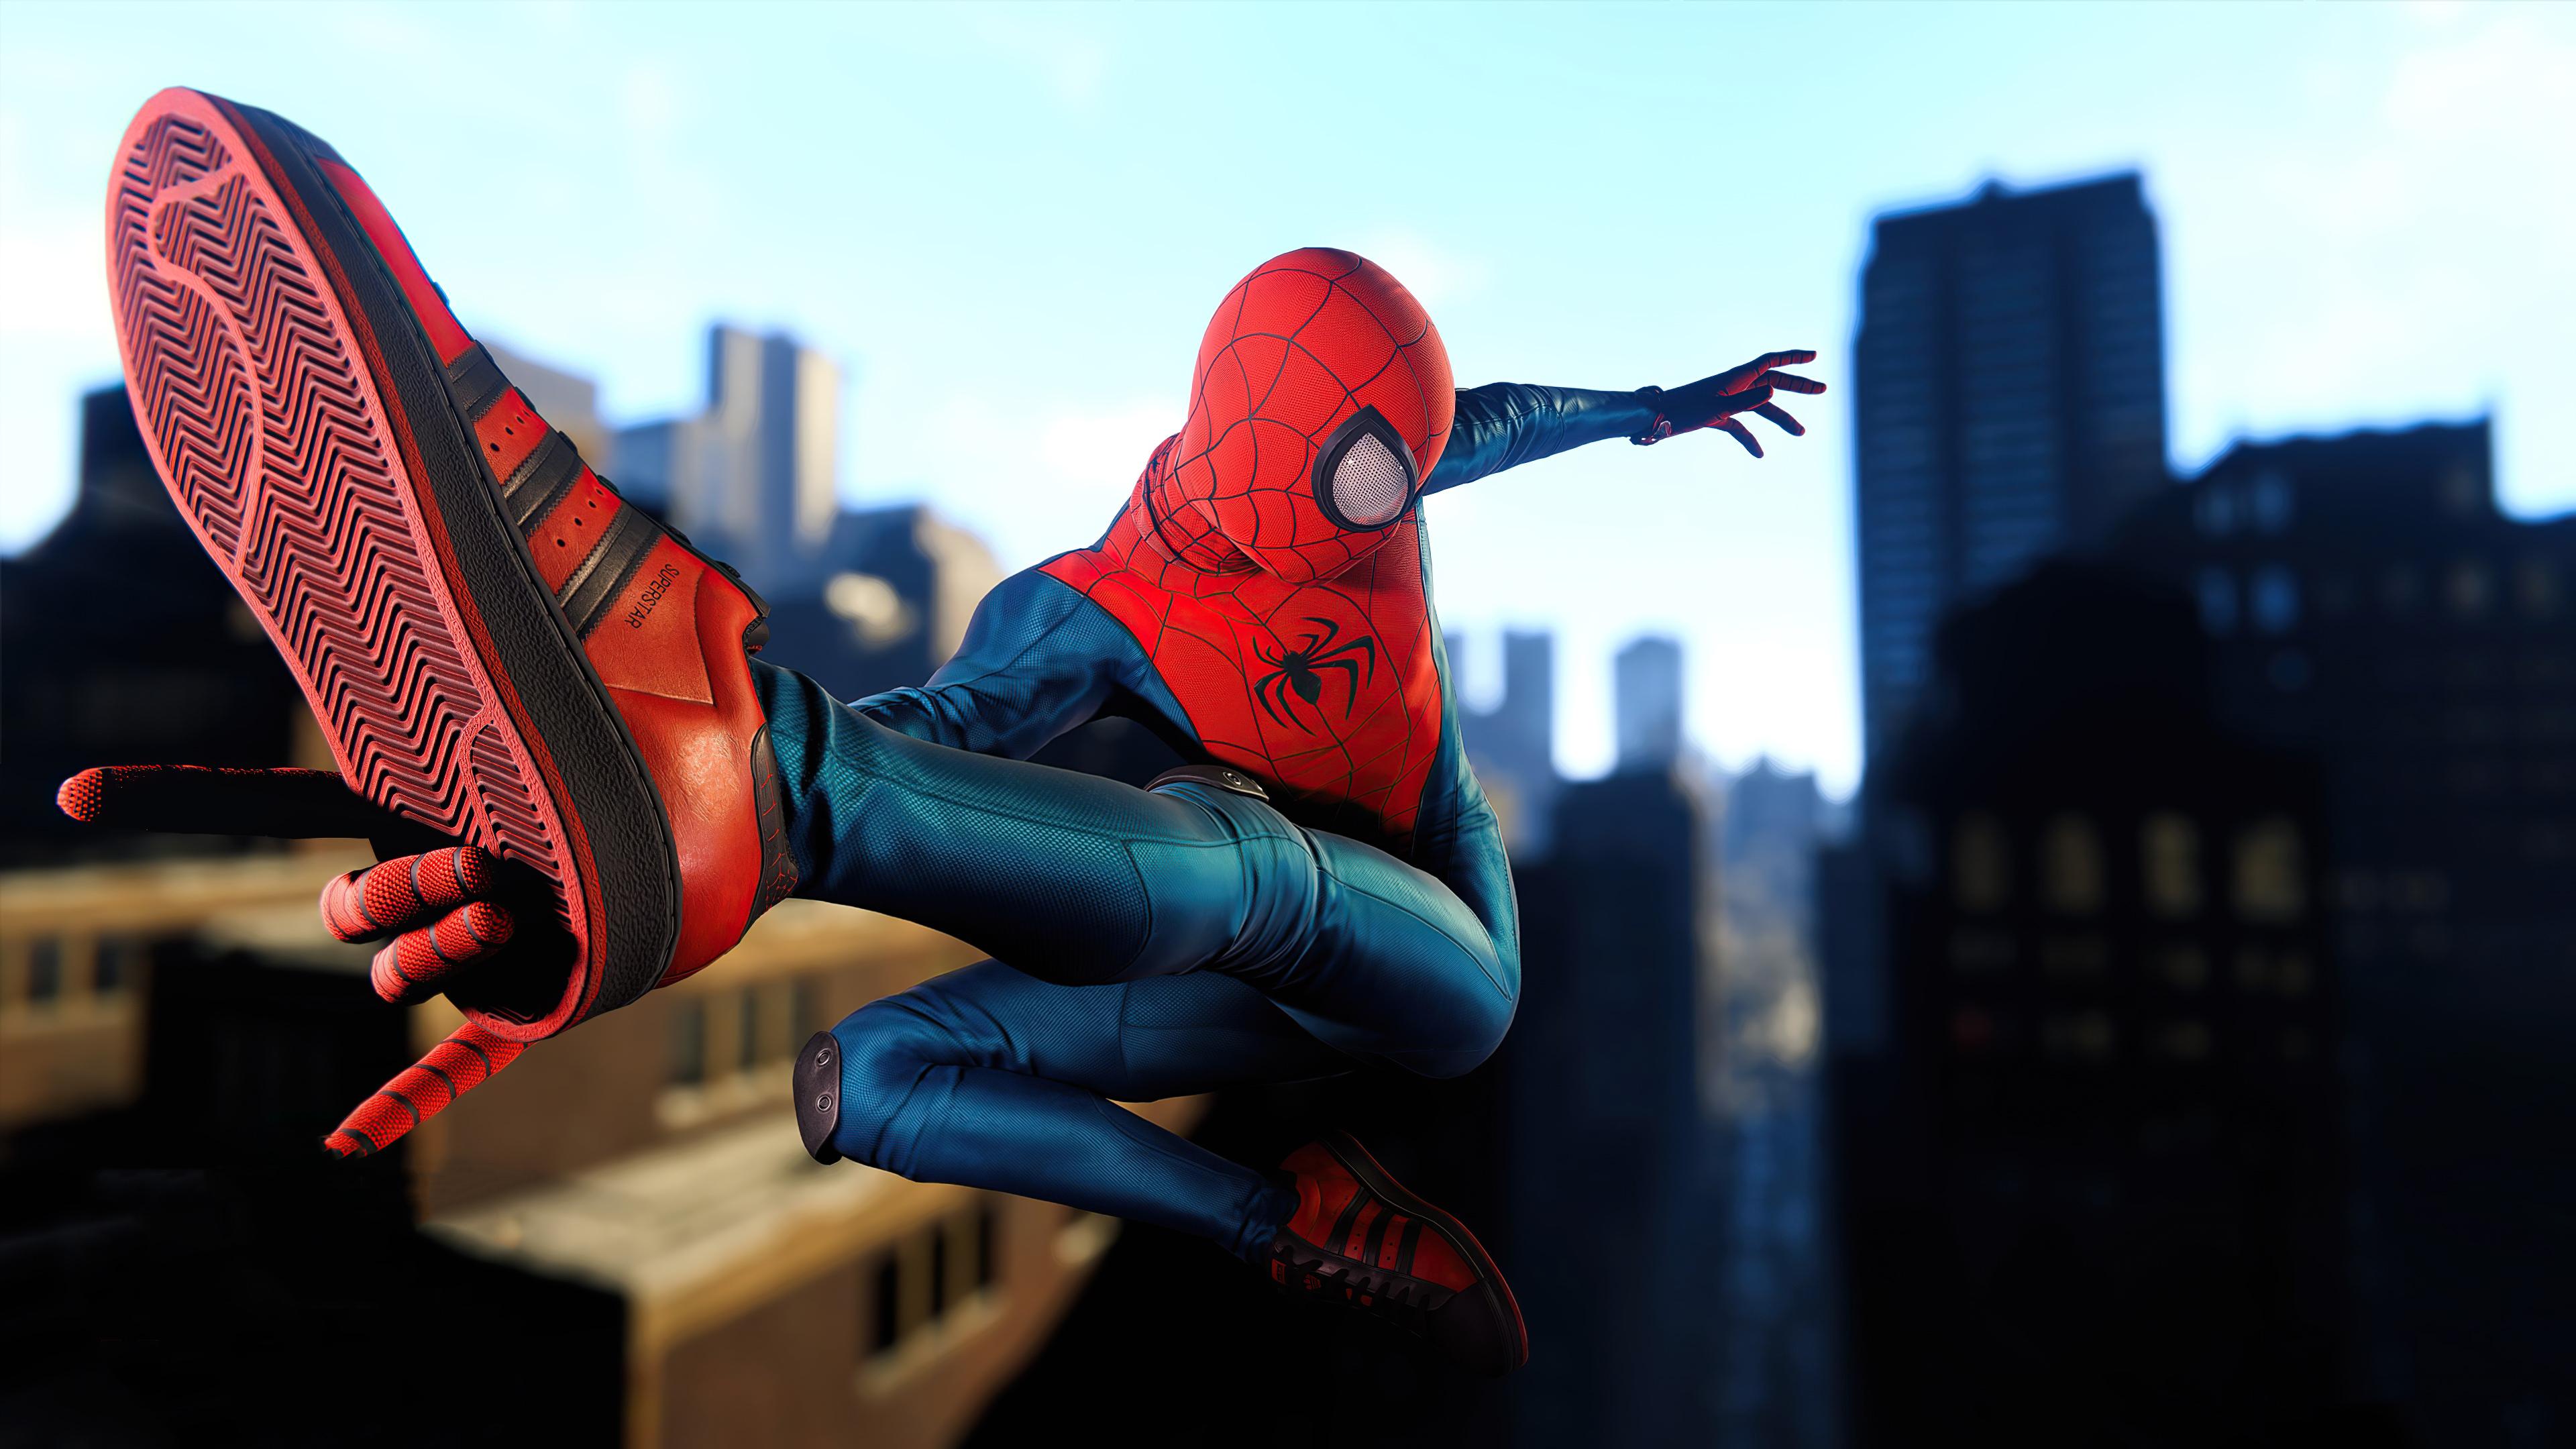 spiderman-miles-morales-2021-4k-jc.jpg